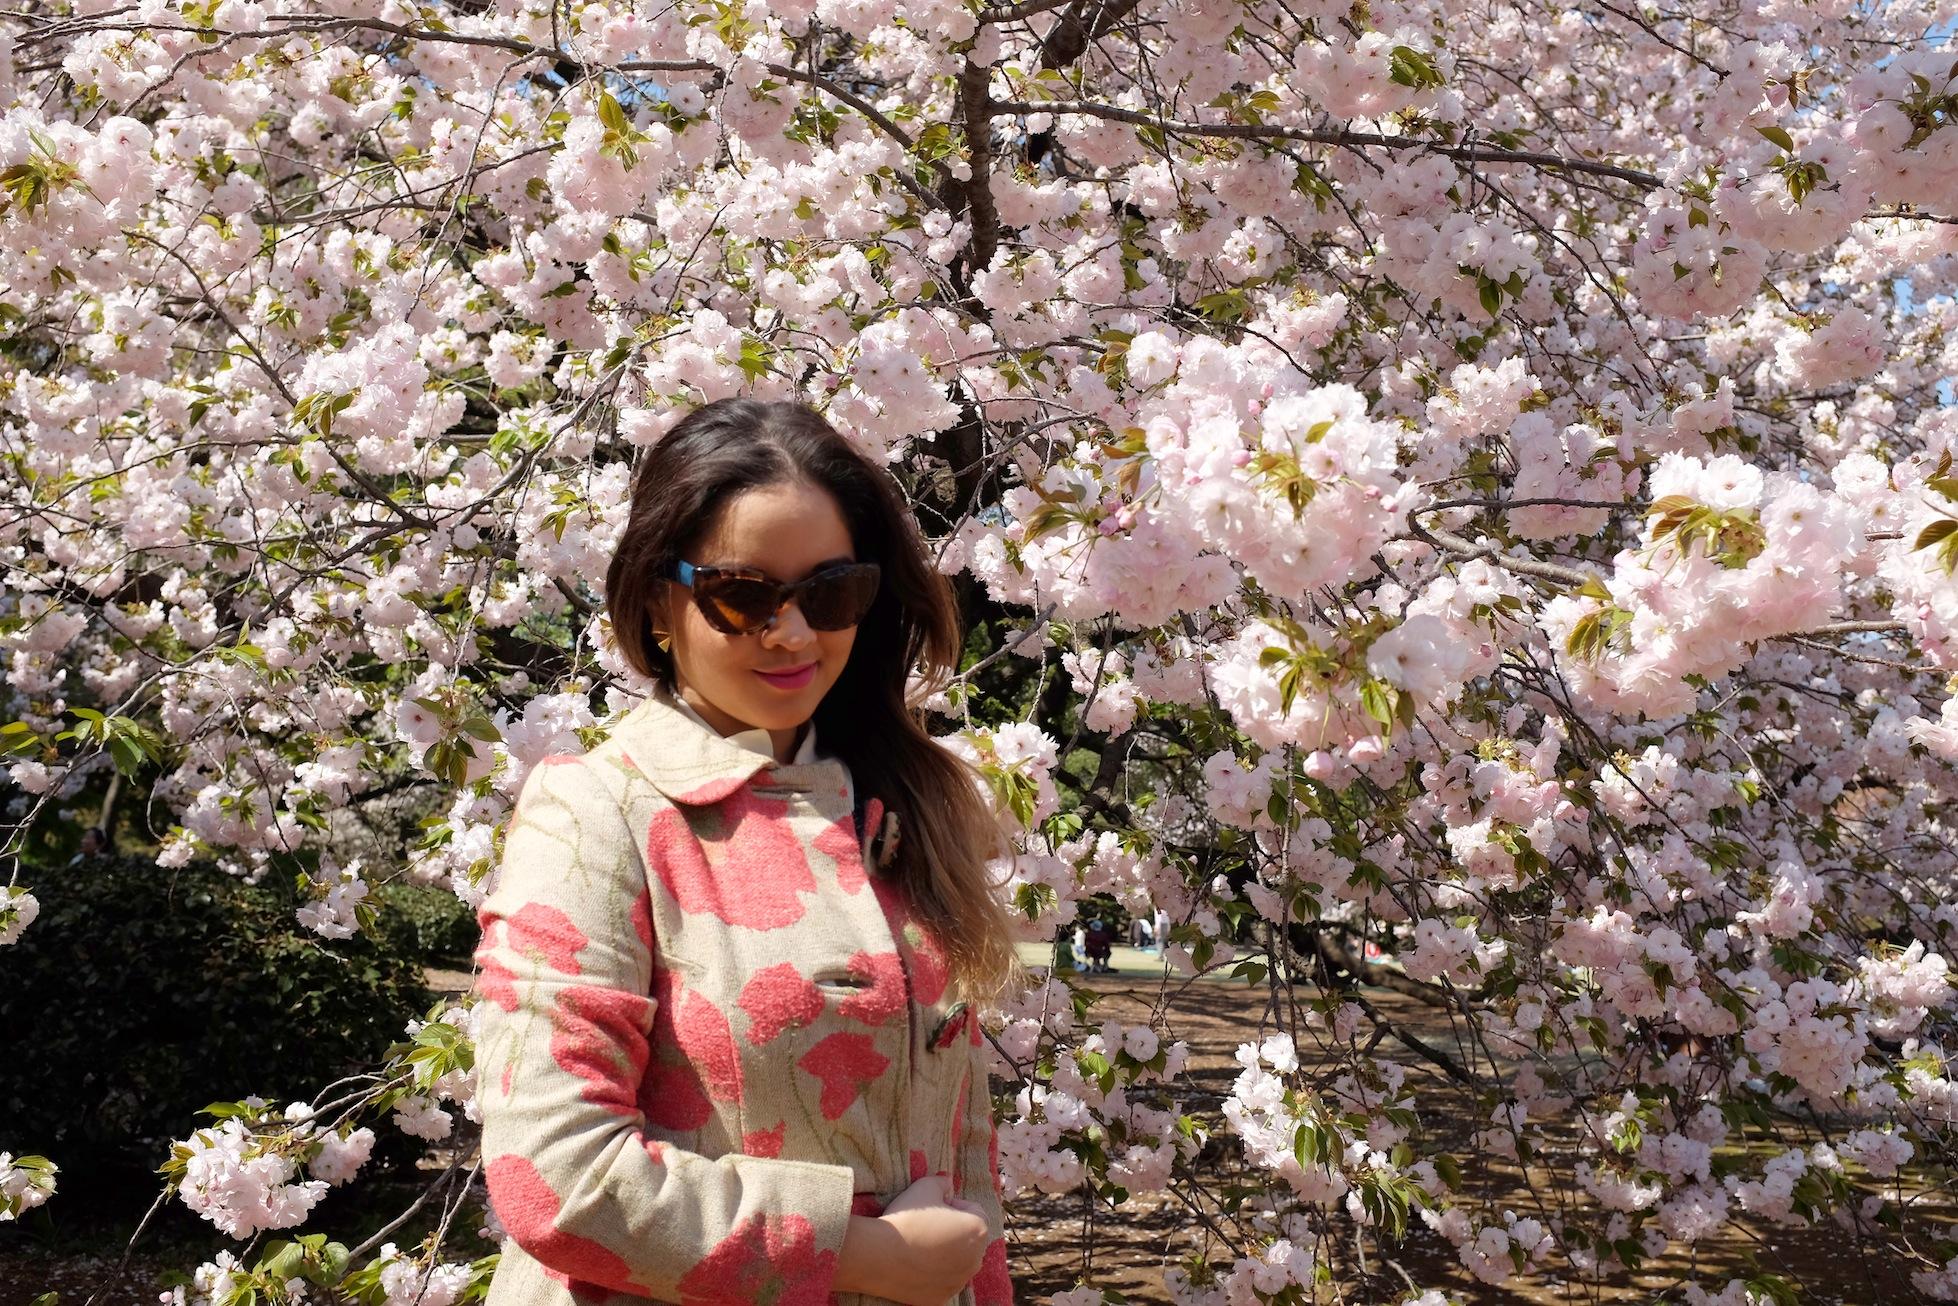 sakura, cherry blossom, Shinjuku, shinjuku gyoen national garden, flower, botany, botanical, Spring, Japan, Travel, photography, fashion photography, street photography, romance, love, Nezuki, blogger, MATRIOCHKA by Les Briqu'a * braque, Forever 21, Uniqlo, Lovisa, Prada, Sunglasses, kawaii, sweet, cute